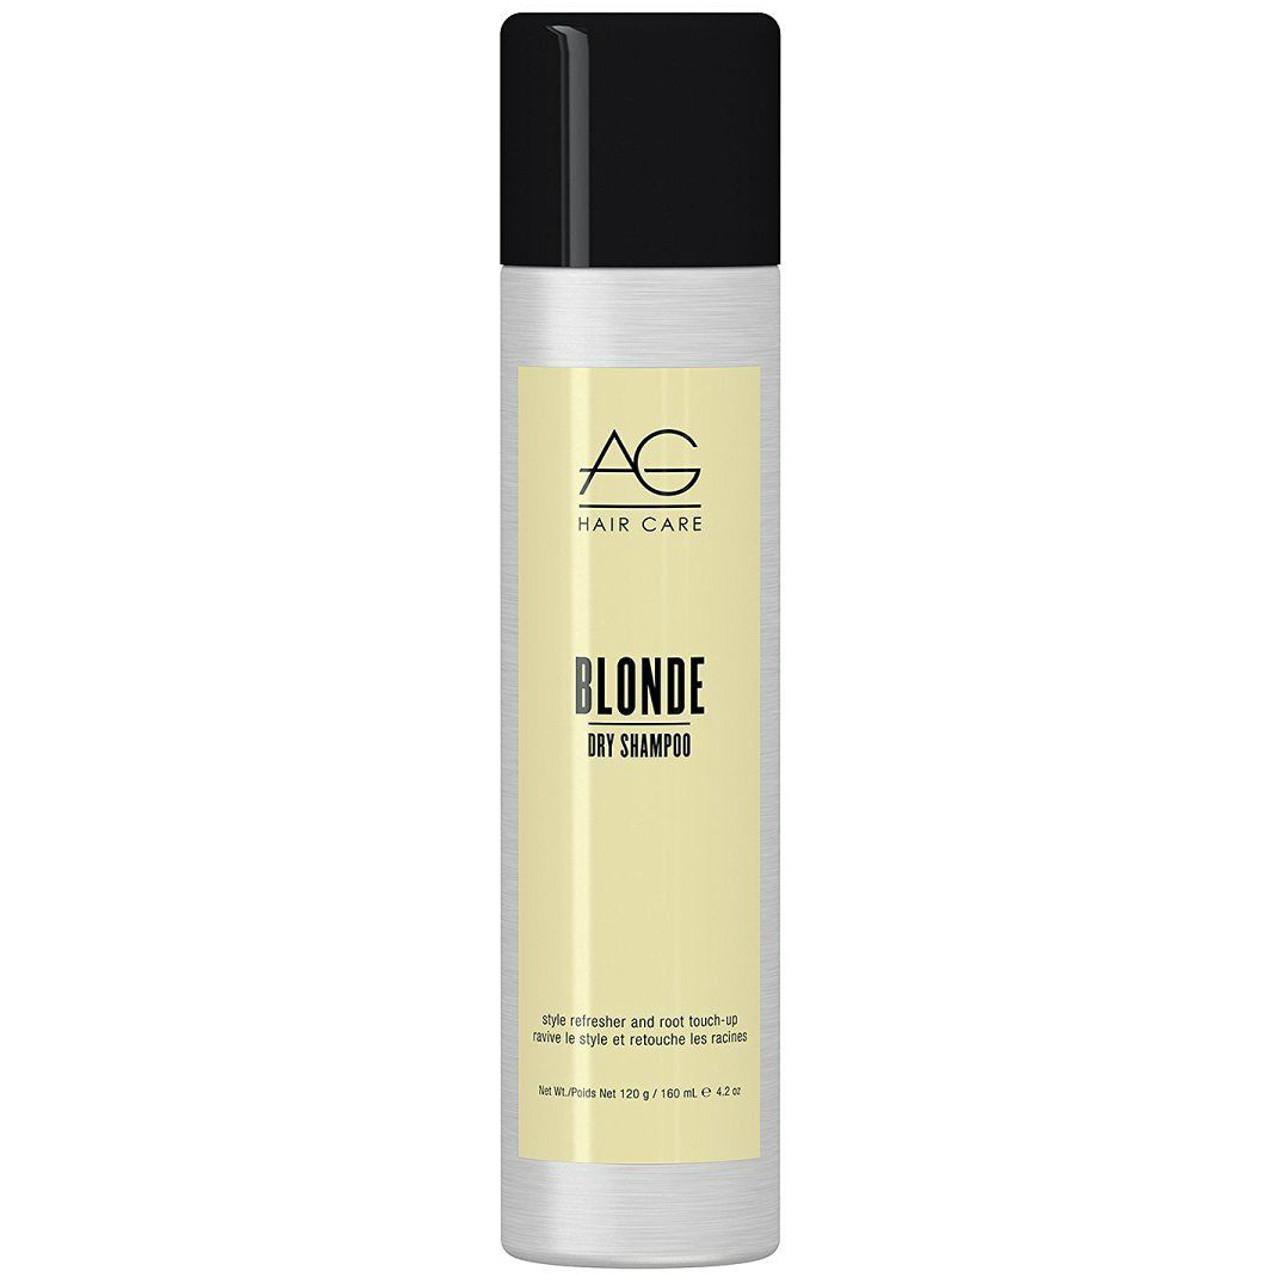 AG Blonde Dry Shampoo 4.2 oz